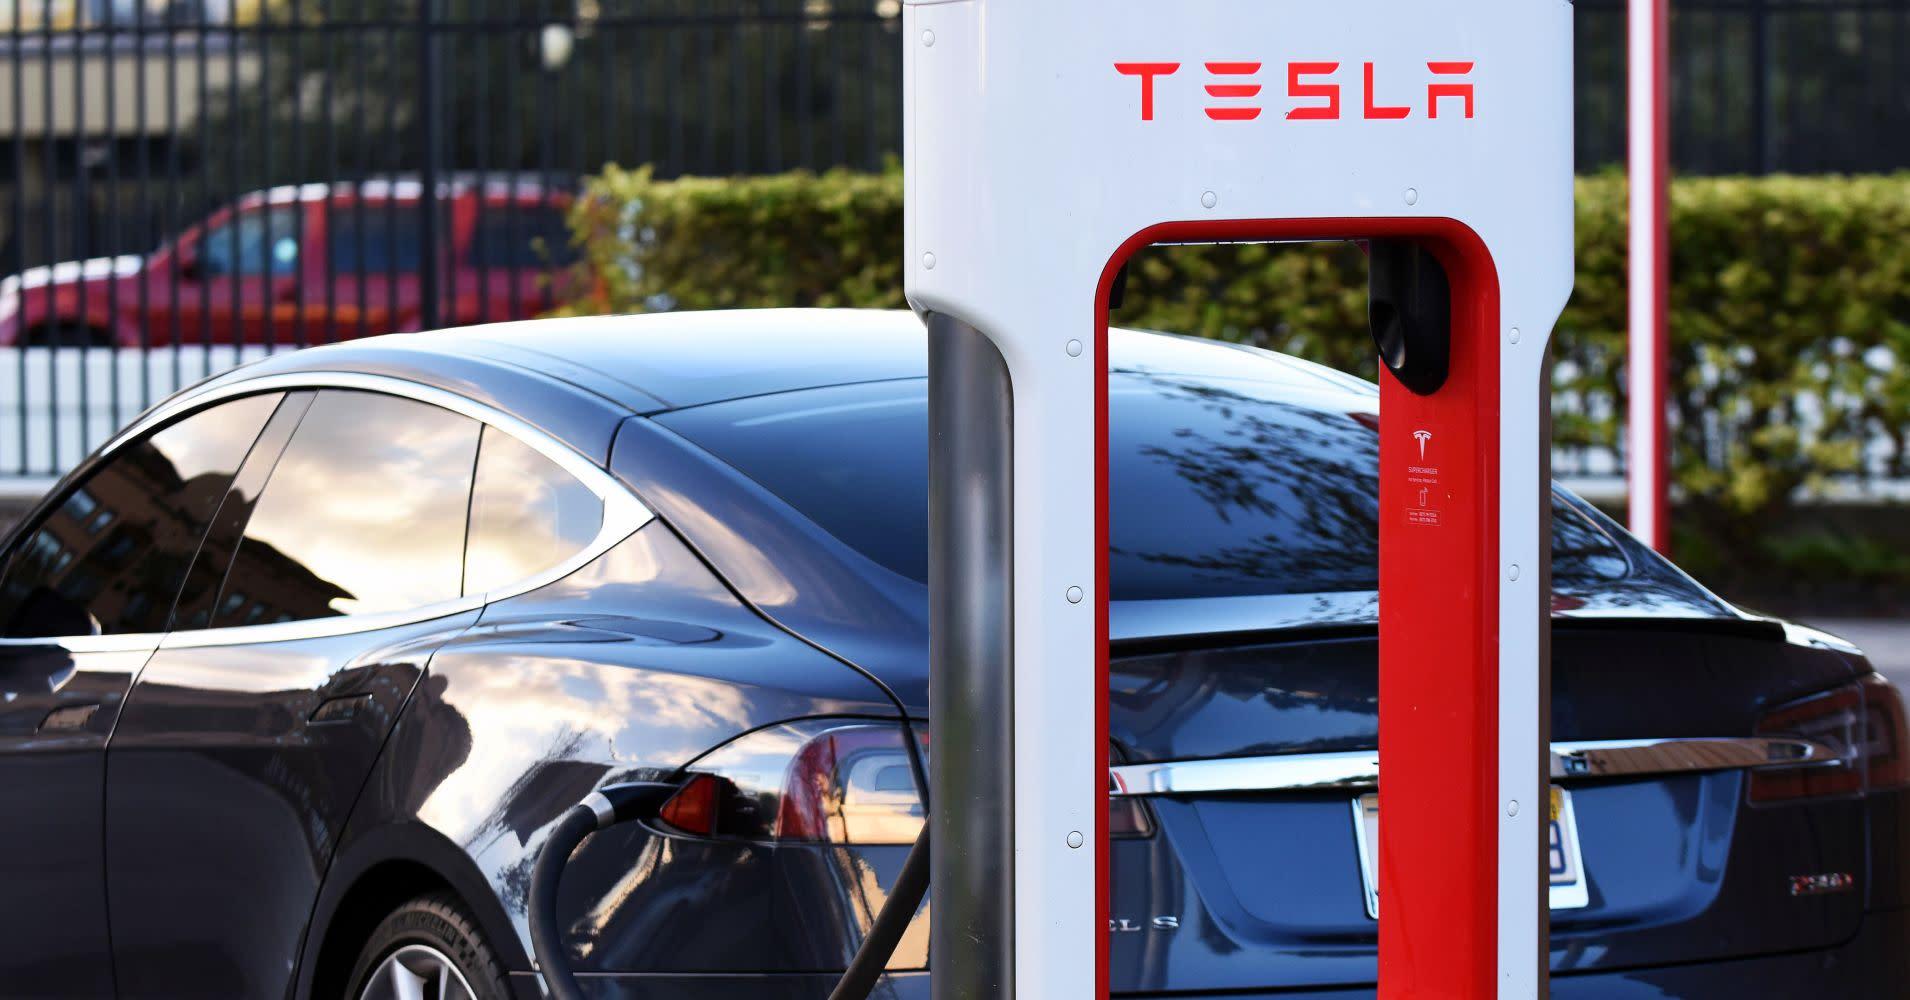 Tesla under Elon Musk is virtually uninvestable, market watcher says